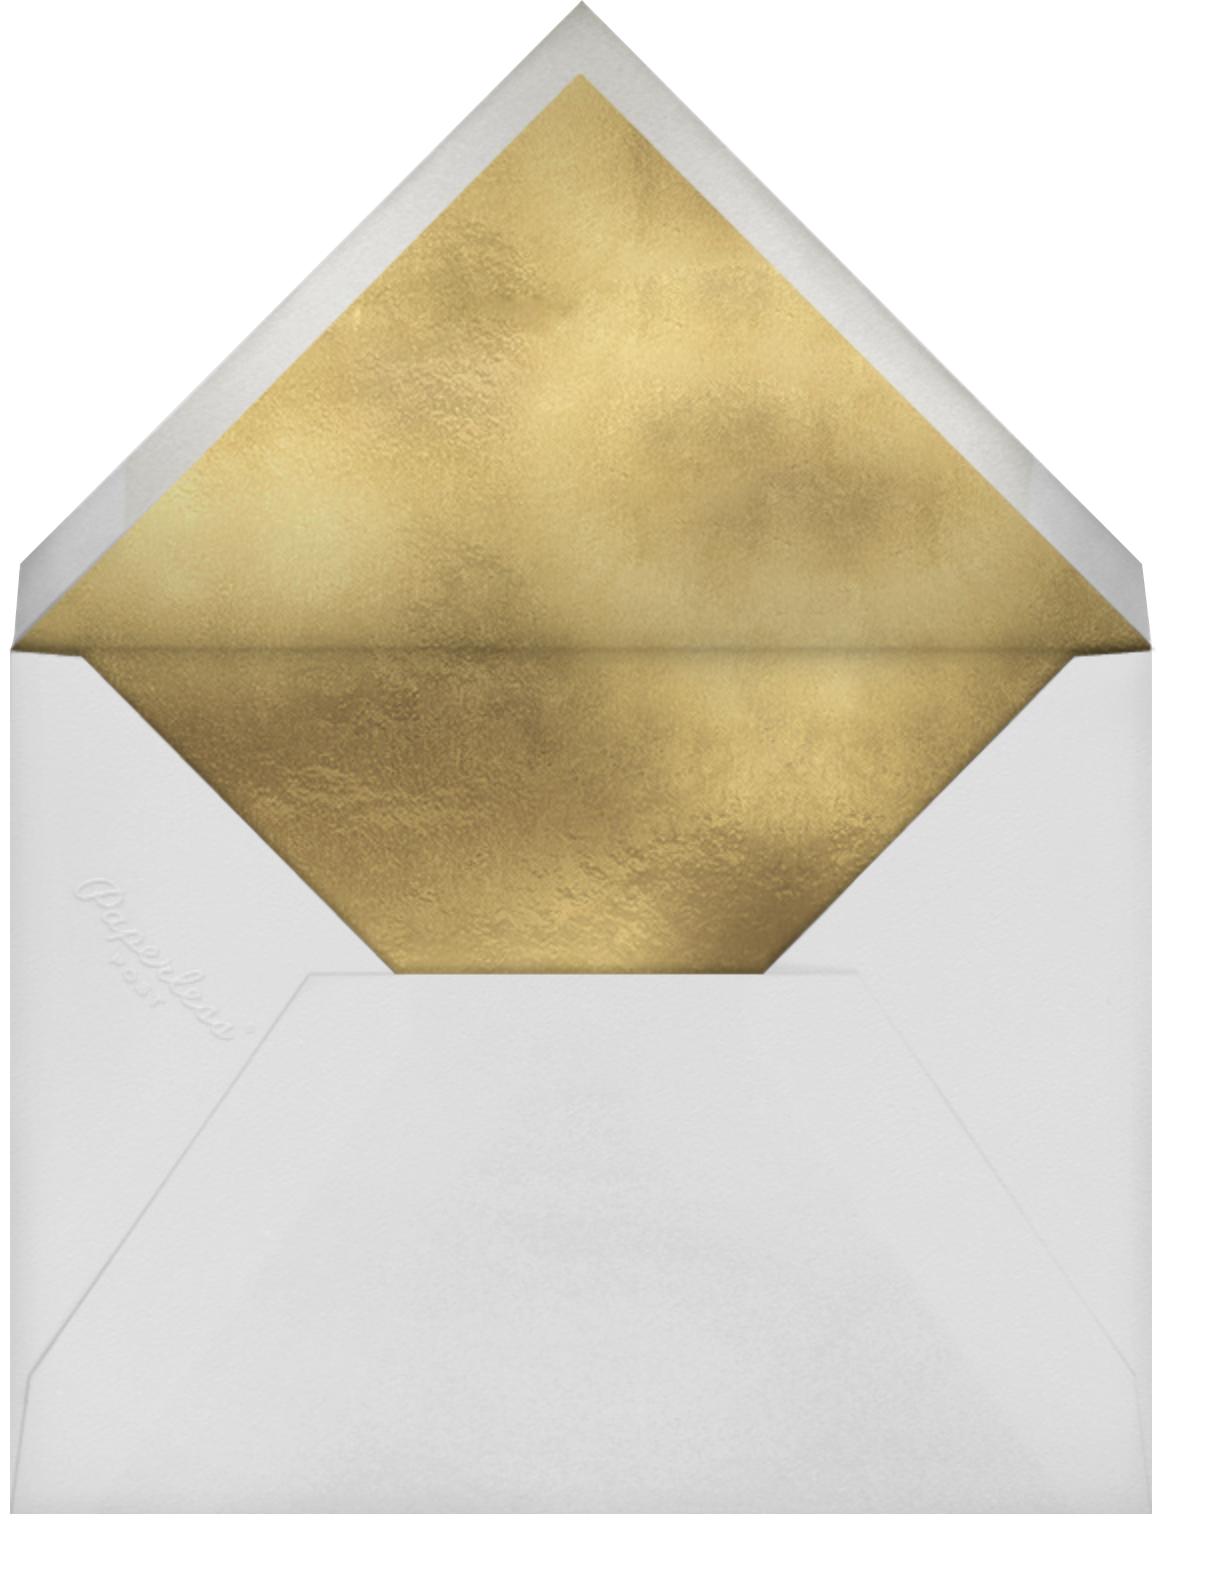 Ethereal Wash Photo - Ashley G - Mother's Day - envelope back